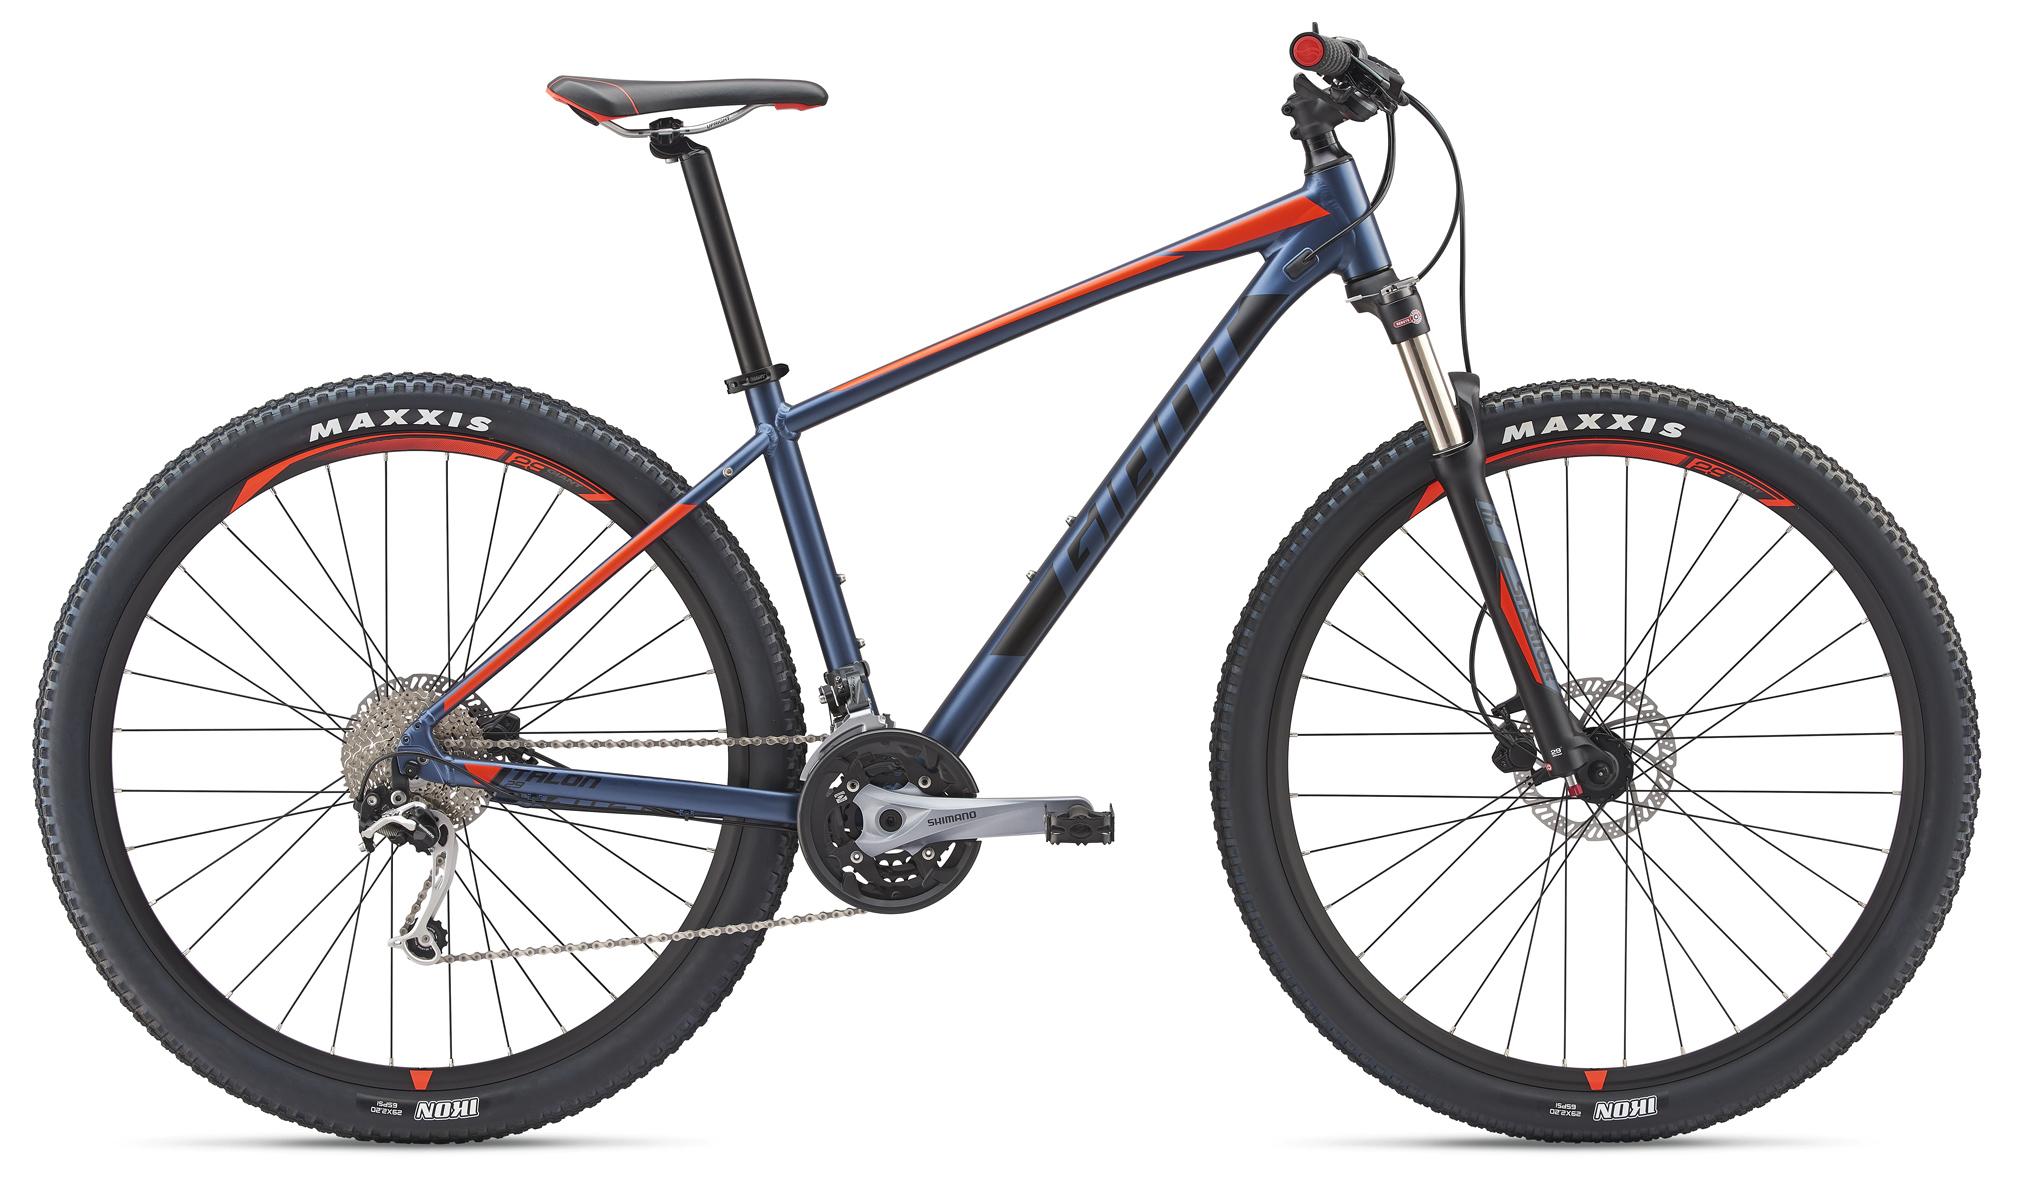 Велосипед Giant Talon 29 2 GE 2019 бит bosch ph2 х25мм 25шт 2 607 001 513